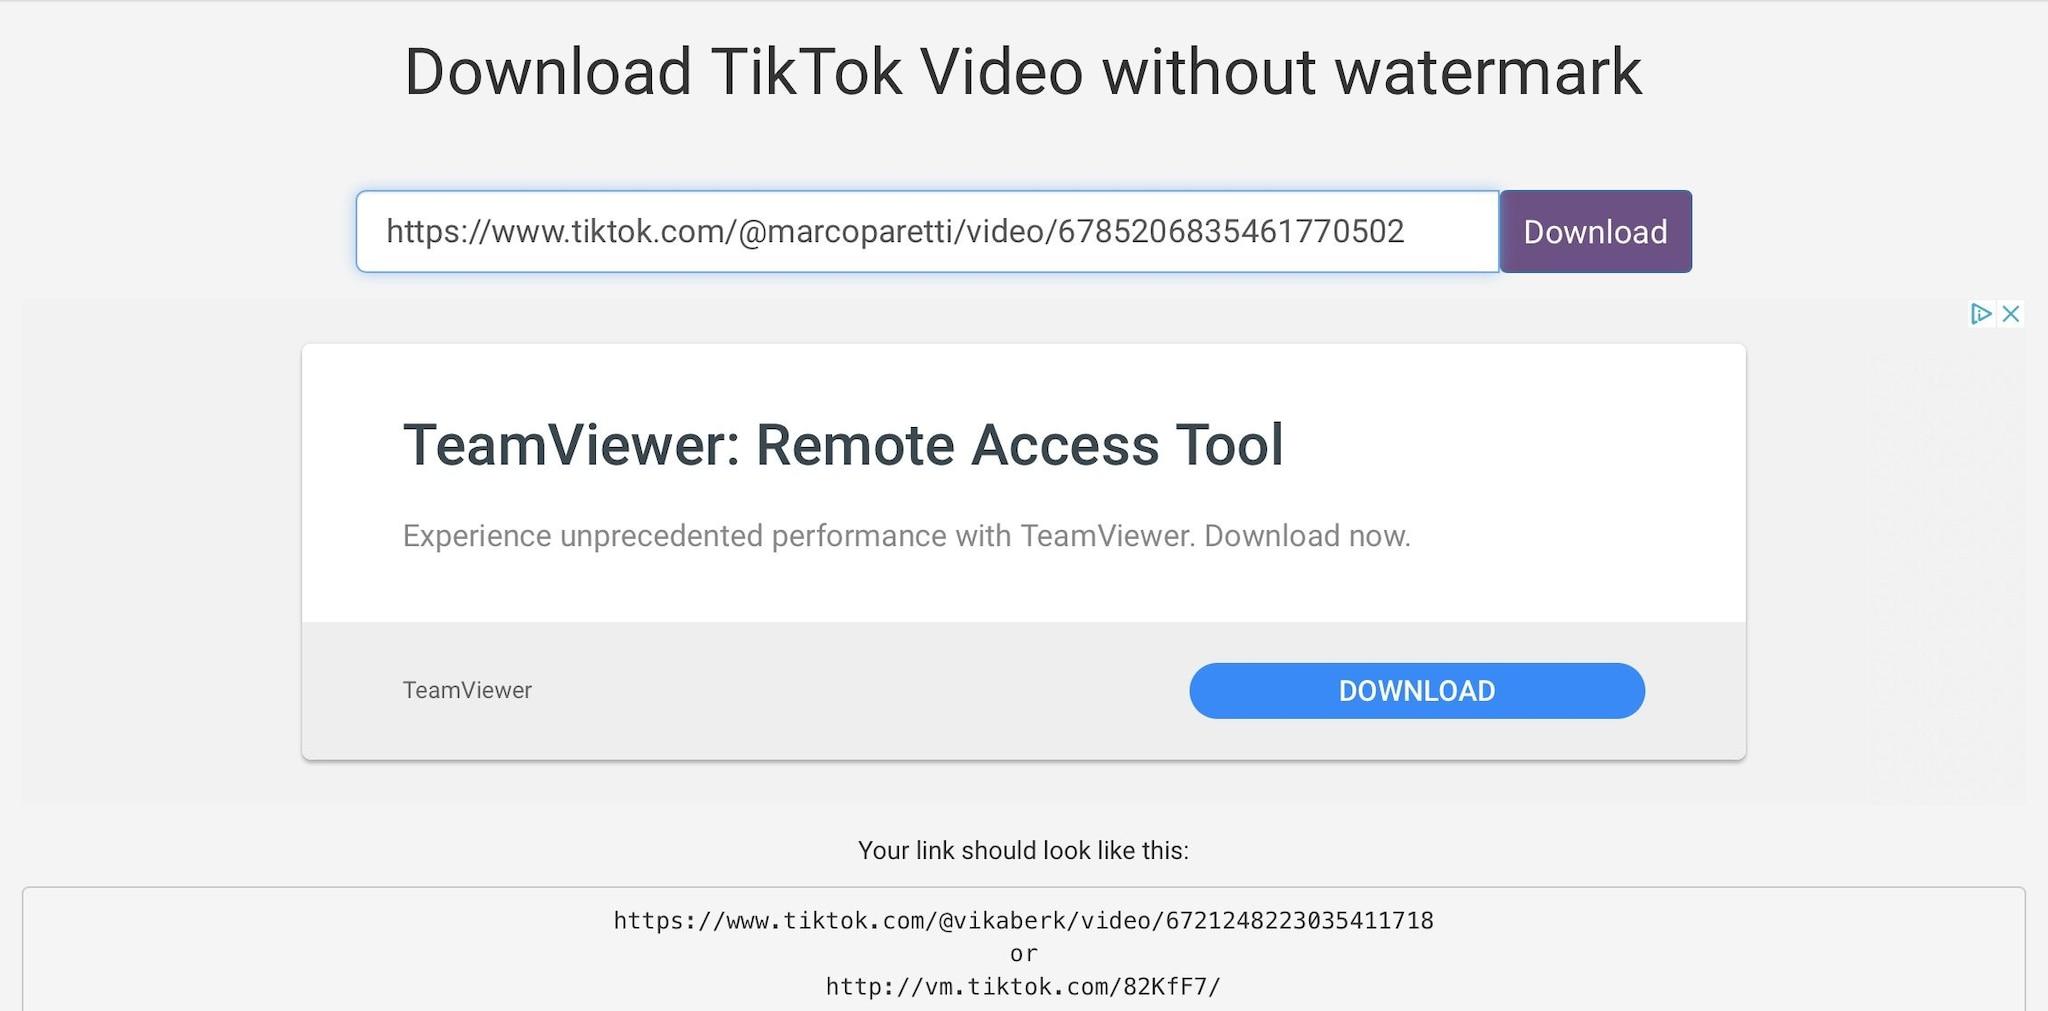 scaricare video tiktok senza logo pubblicare instagram byte